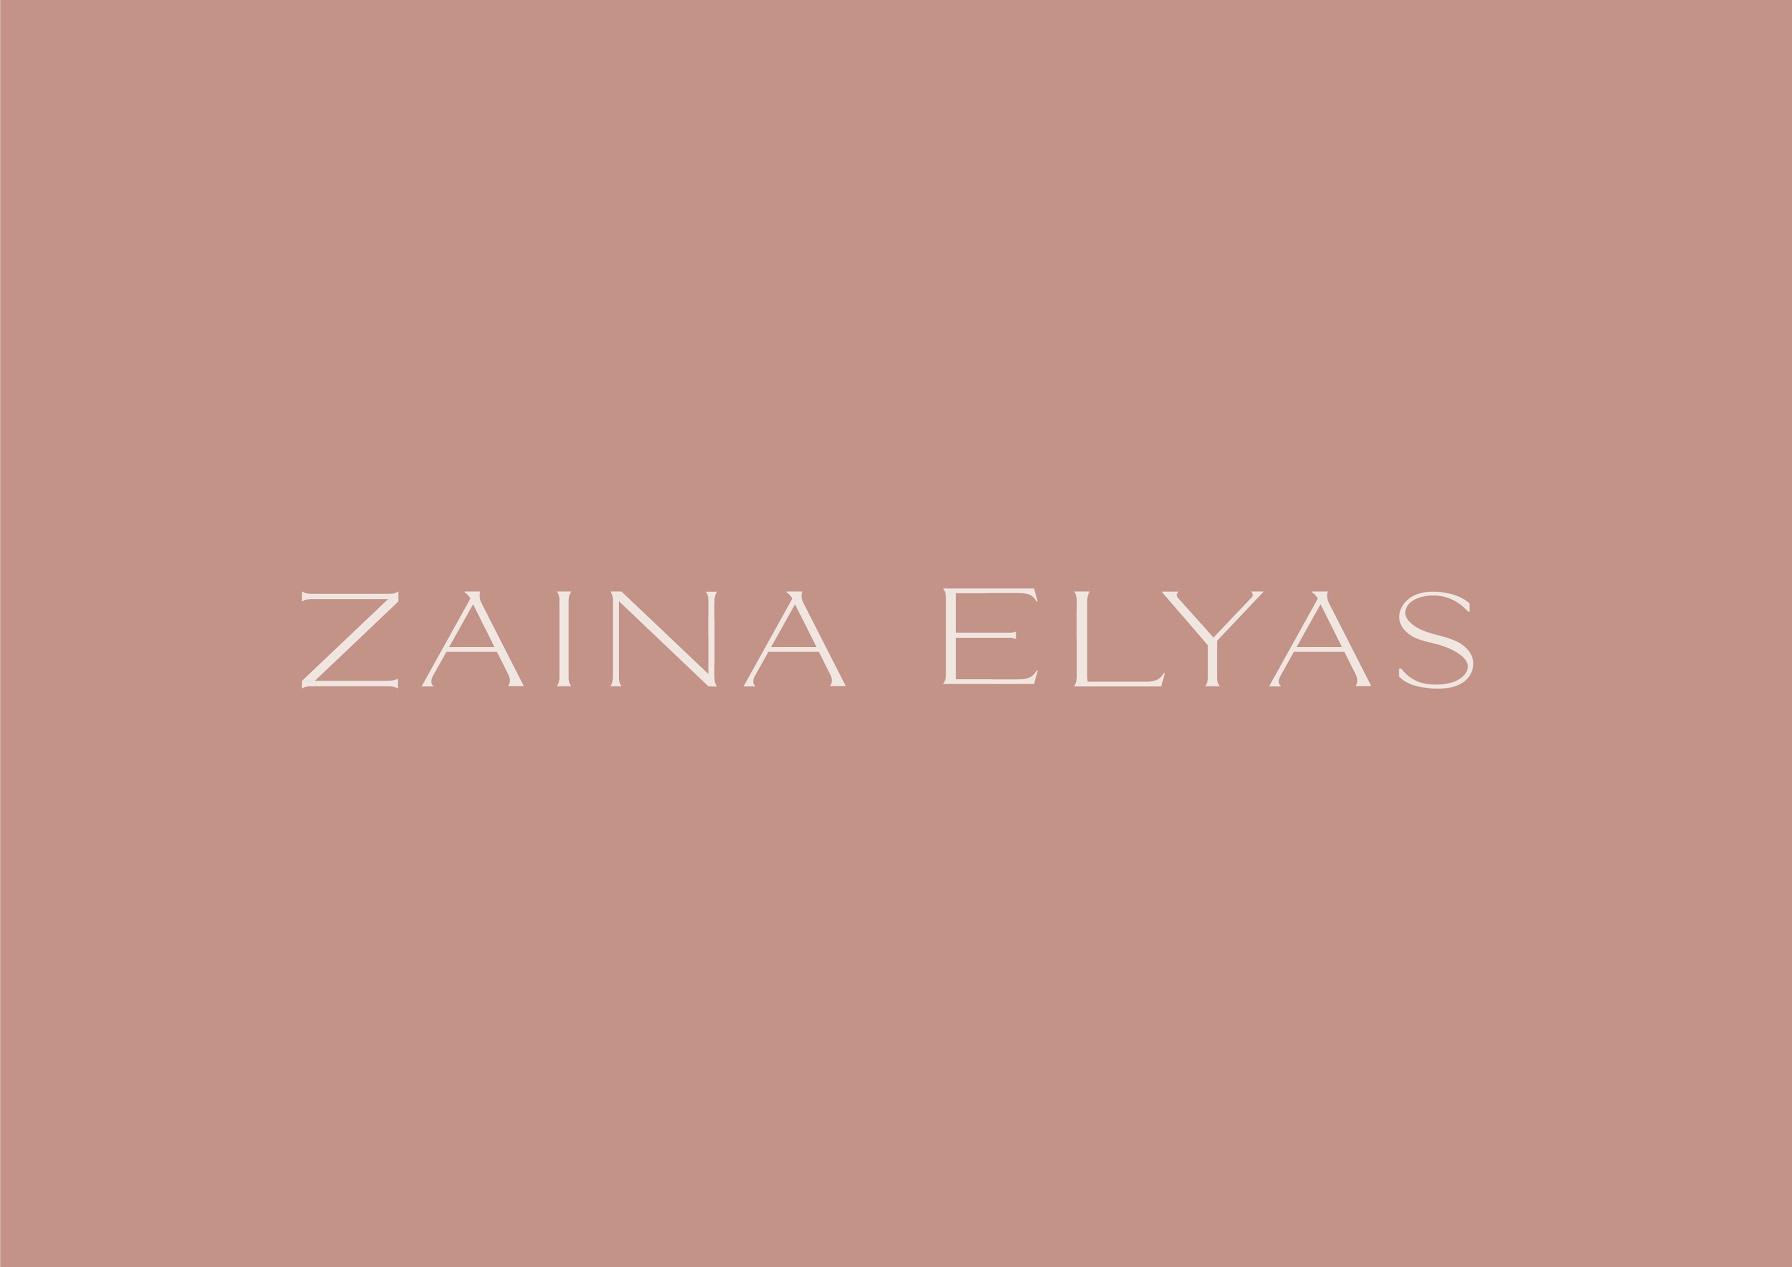 Zaina Elyas